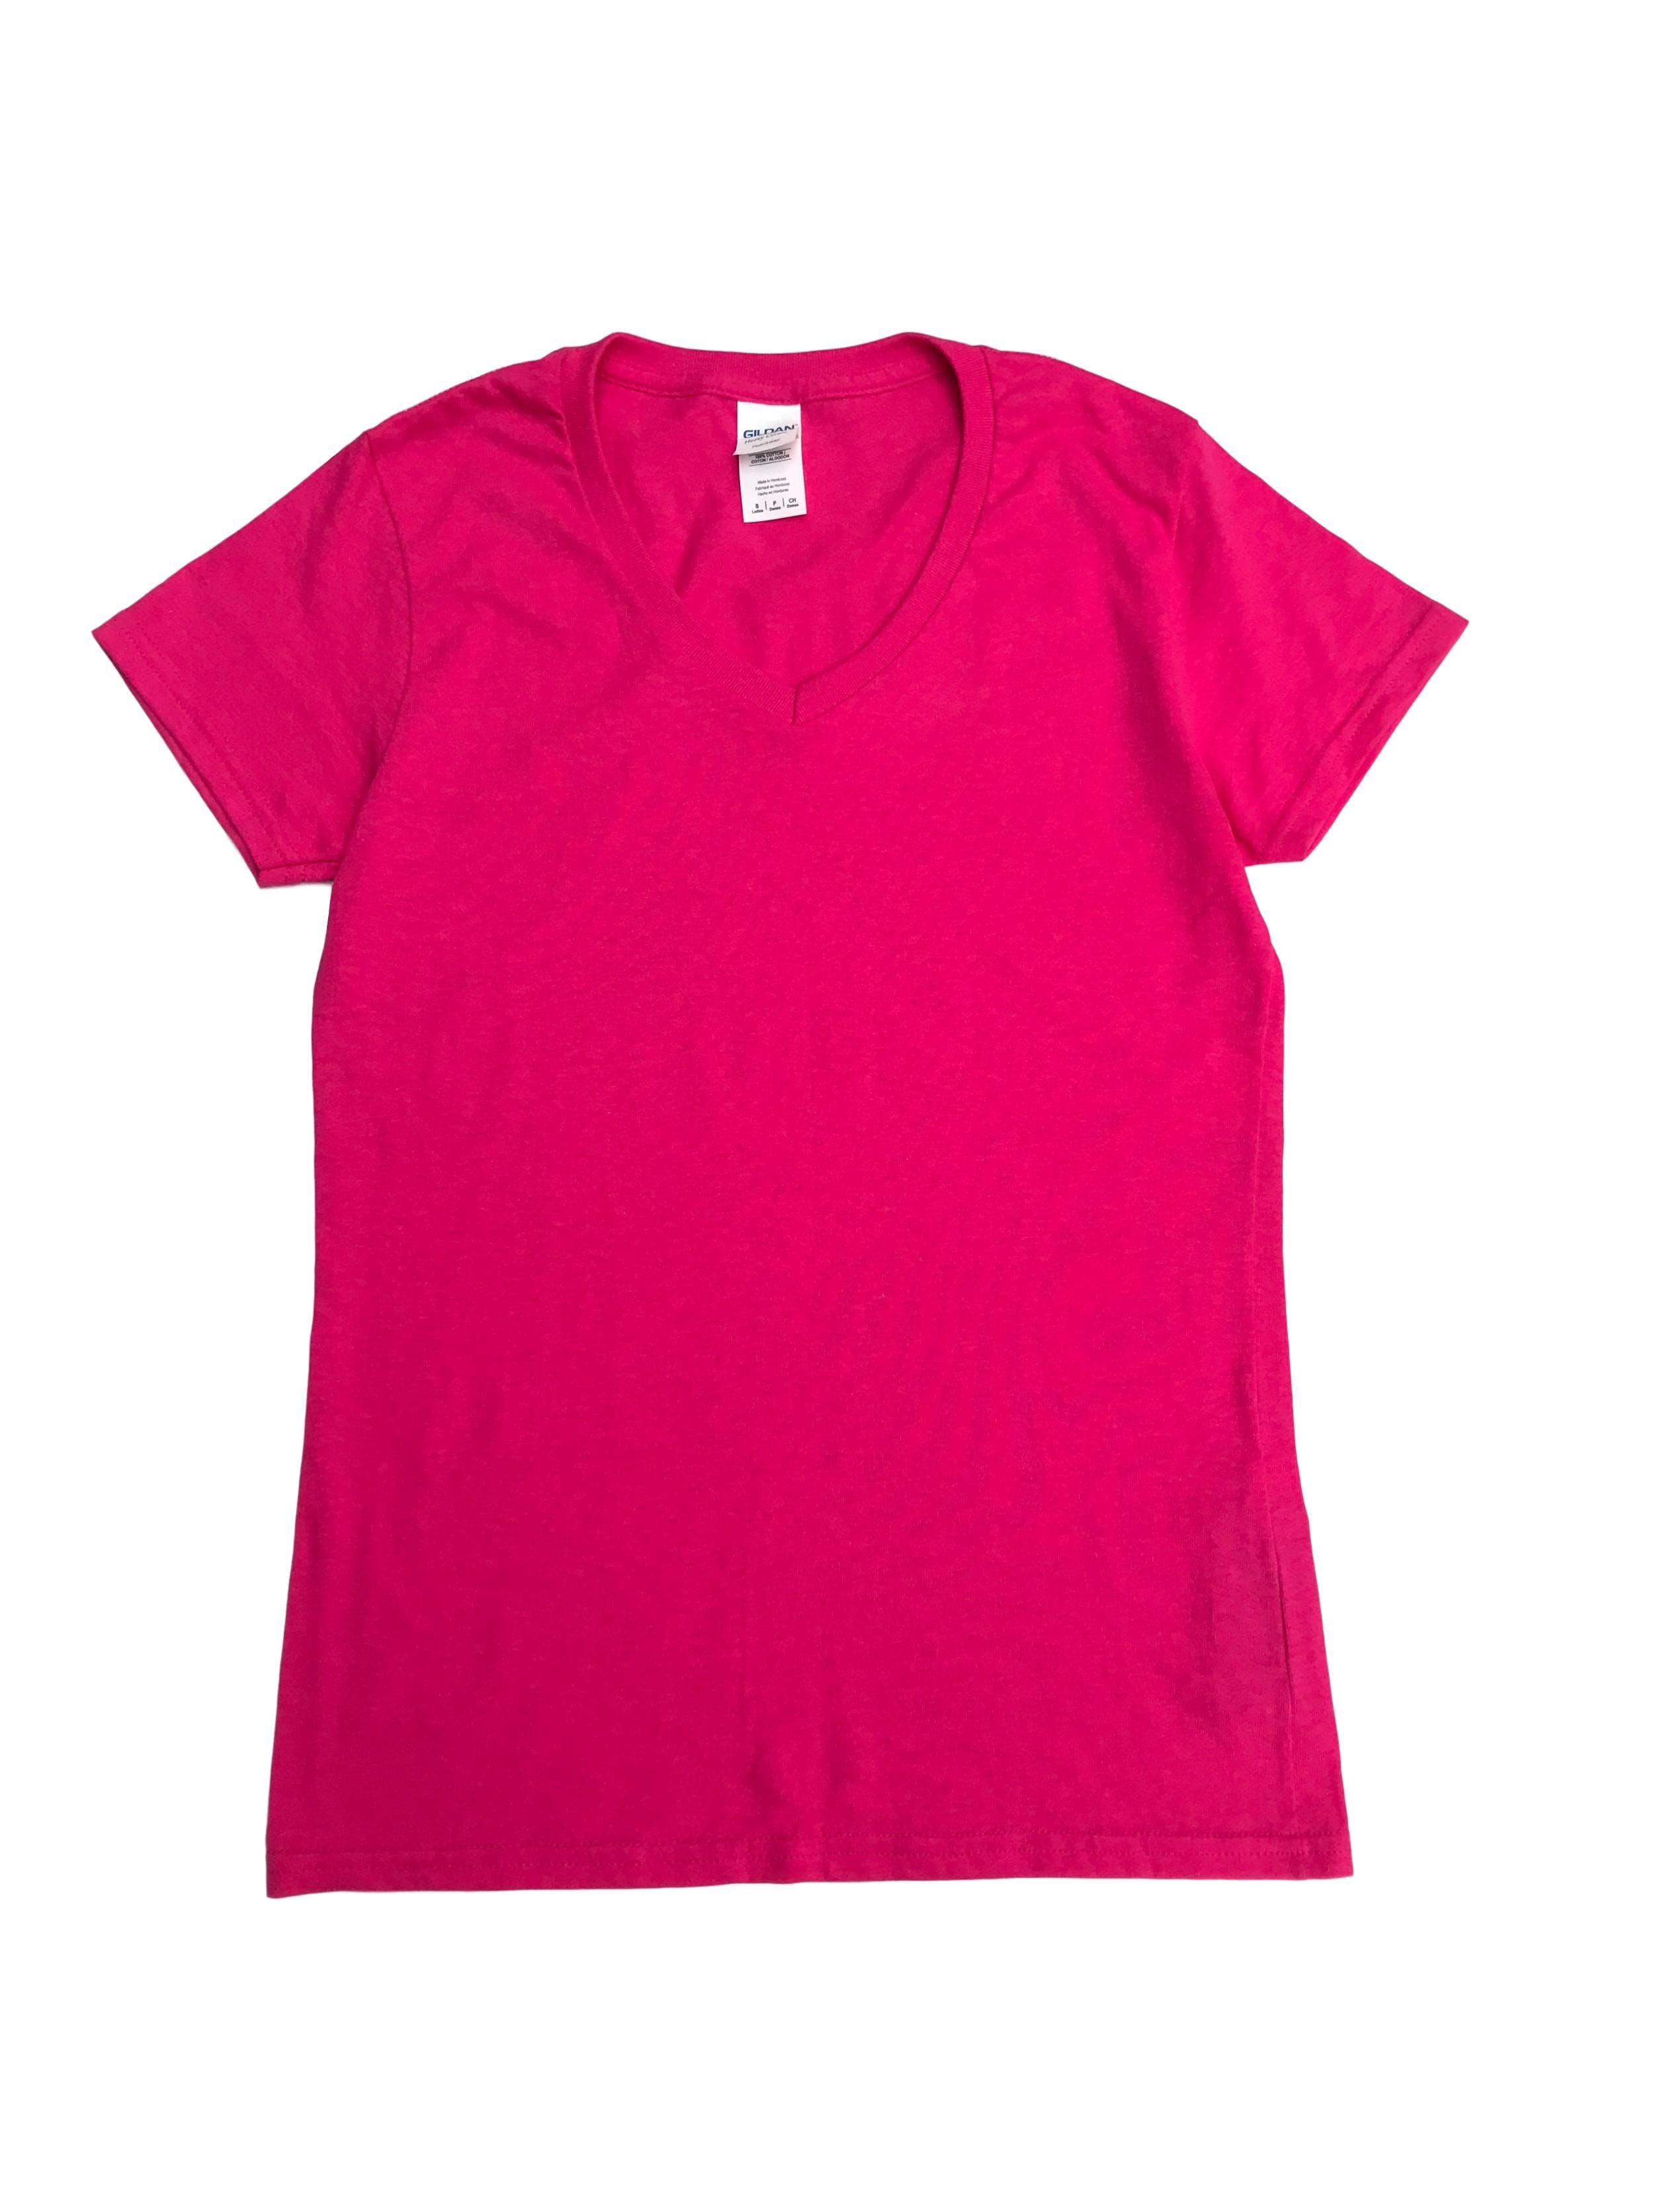 Polo fucsia 100% algodón de tela tipo piqué delgada, manga corta y cuello en V